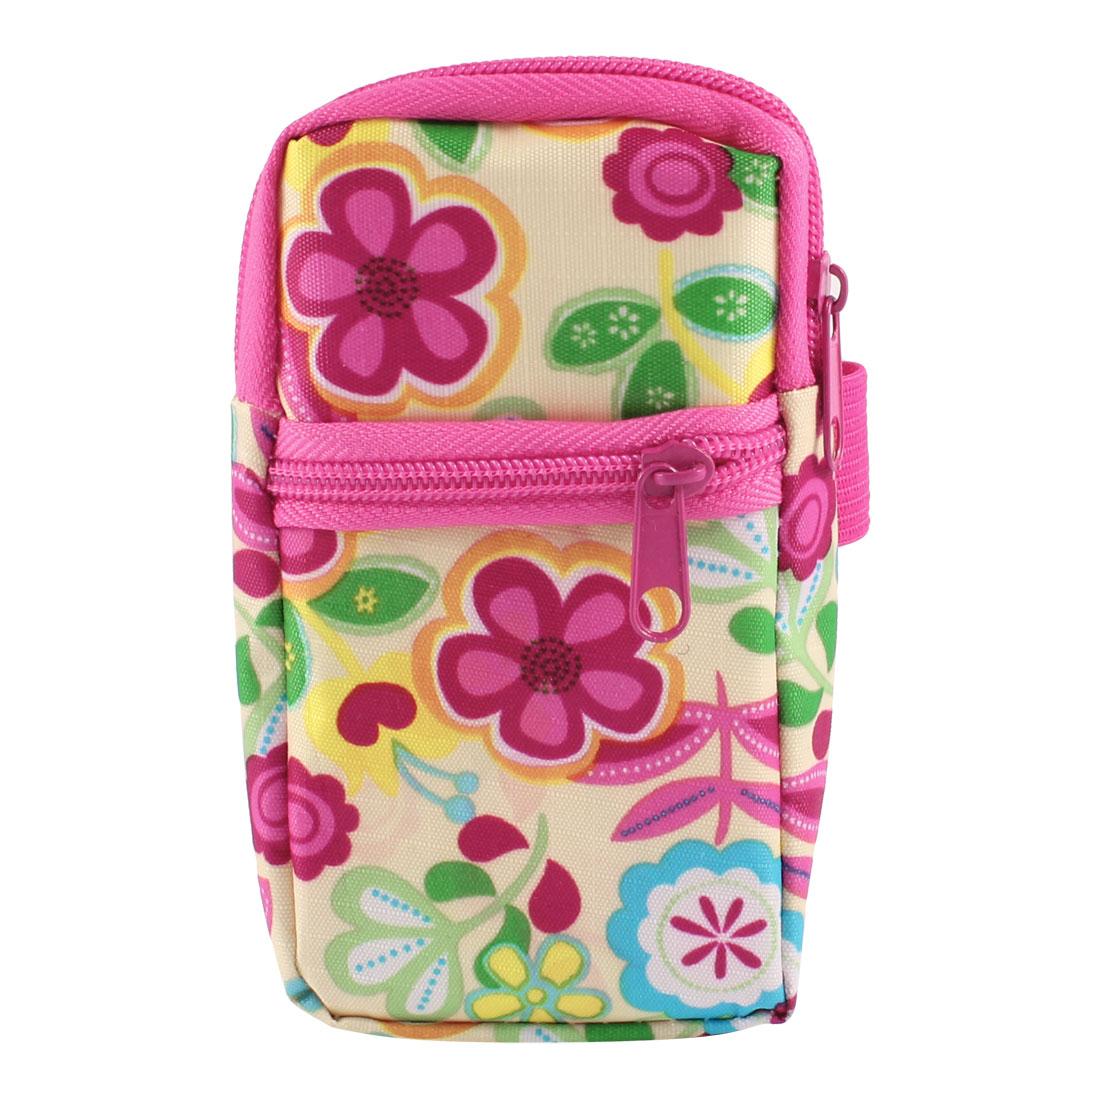 Fuchsia Green Florals Pattern Heart Dangle Zipper Closure Phone Wrist Bag Pouch